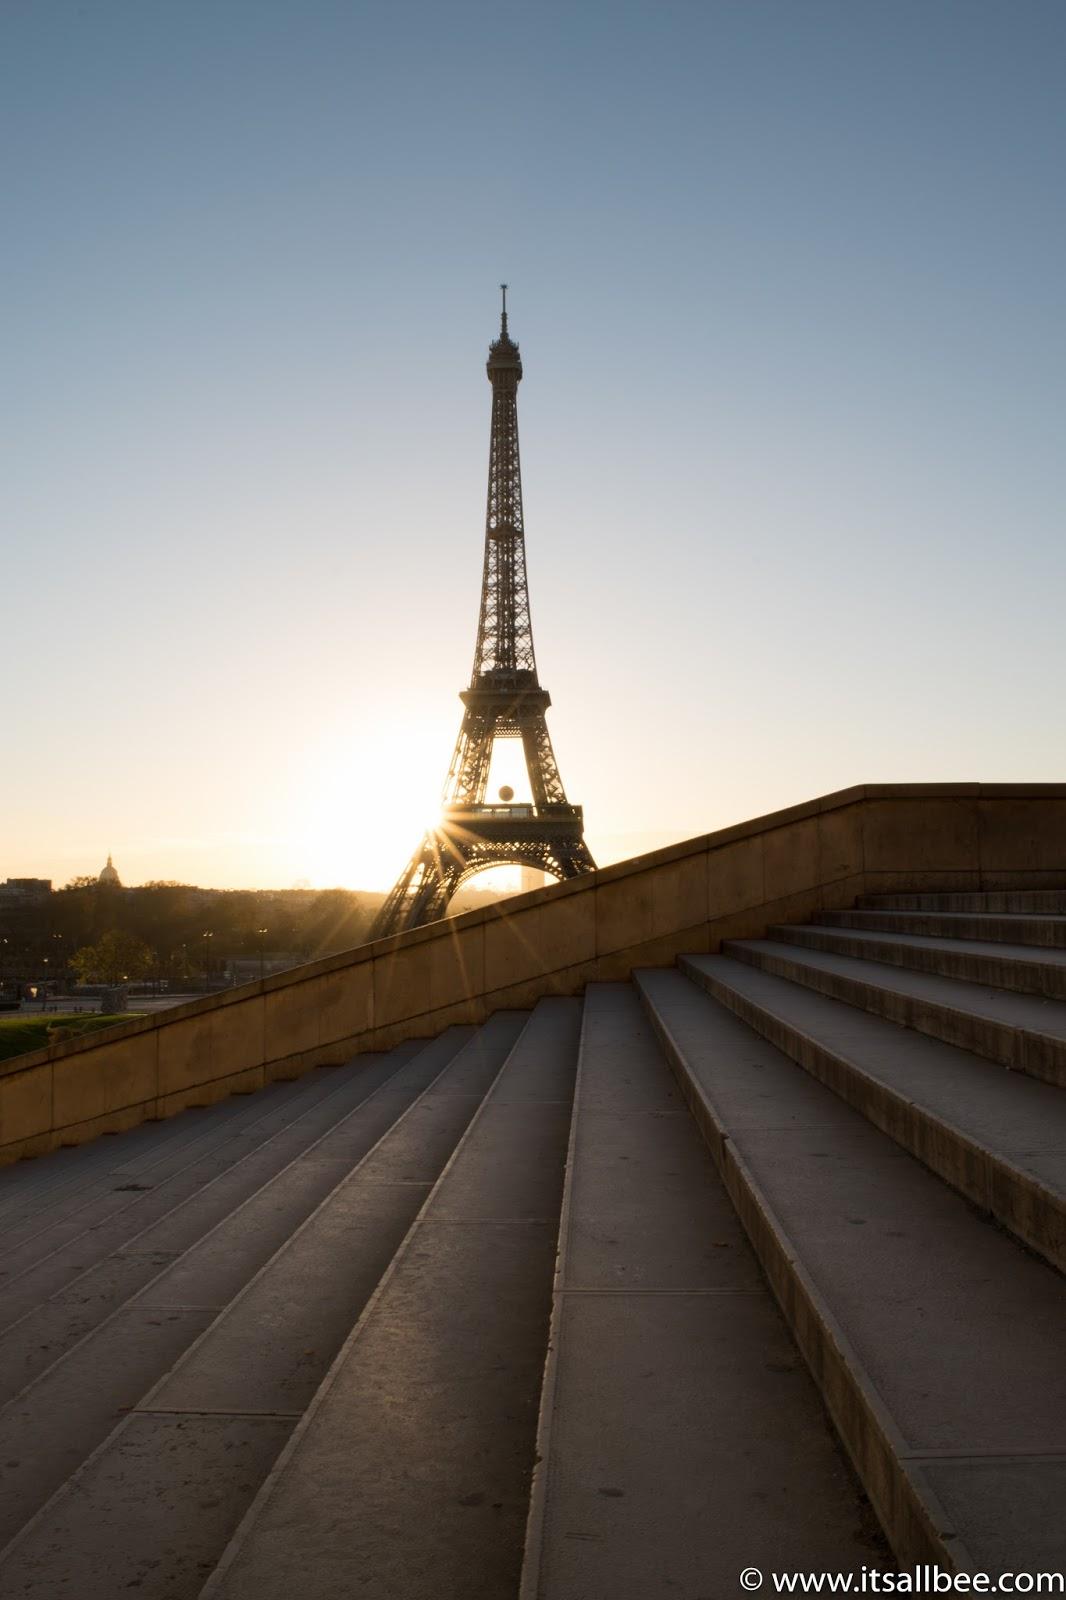 Sunrise In Paris - The Best Spots For Sunrise Photography In Paris #photography #sunrise #sunset #tips #earlyrise #trocadero #eiffeltower #cityoflight